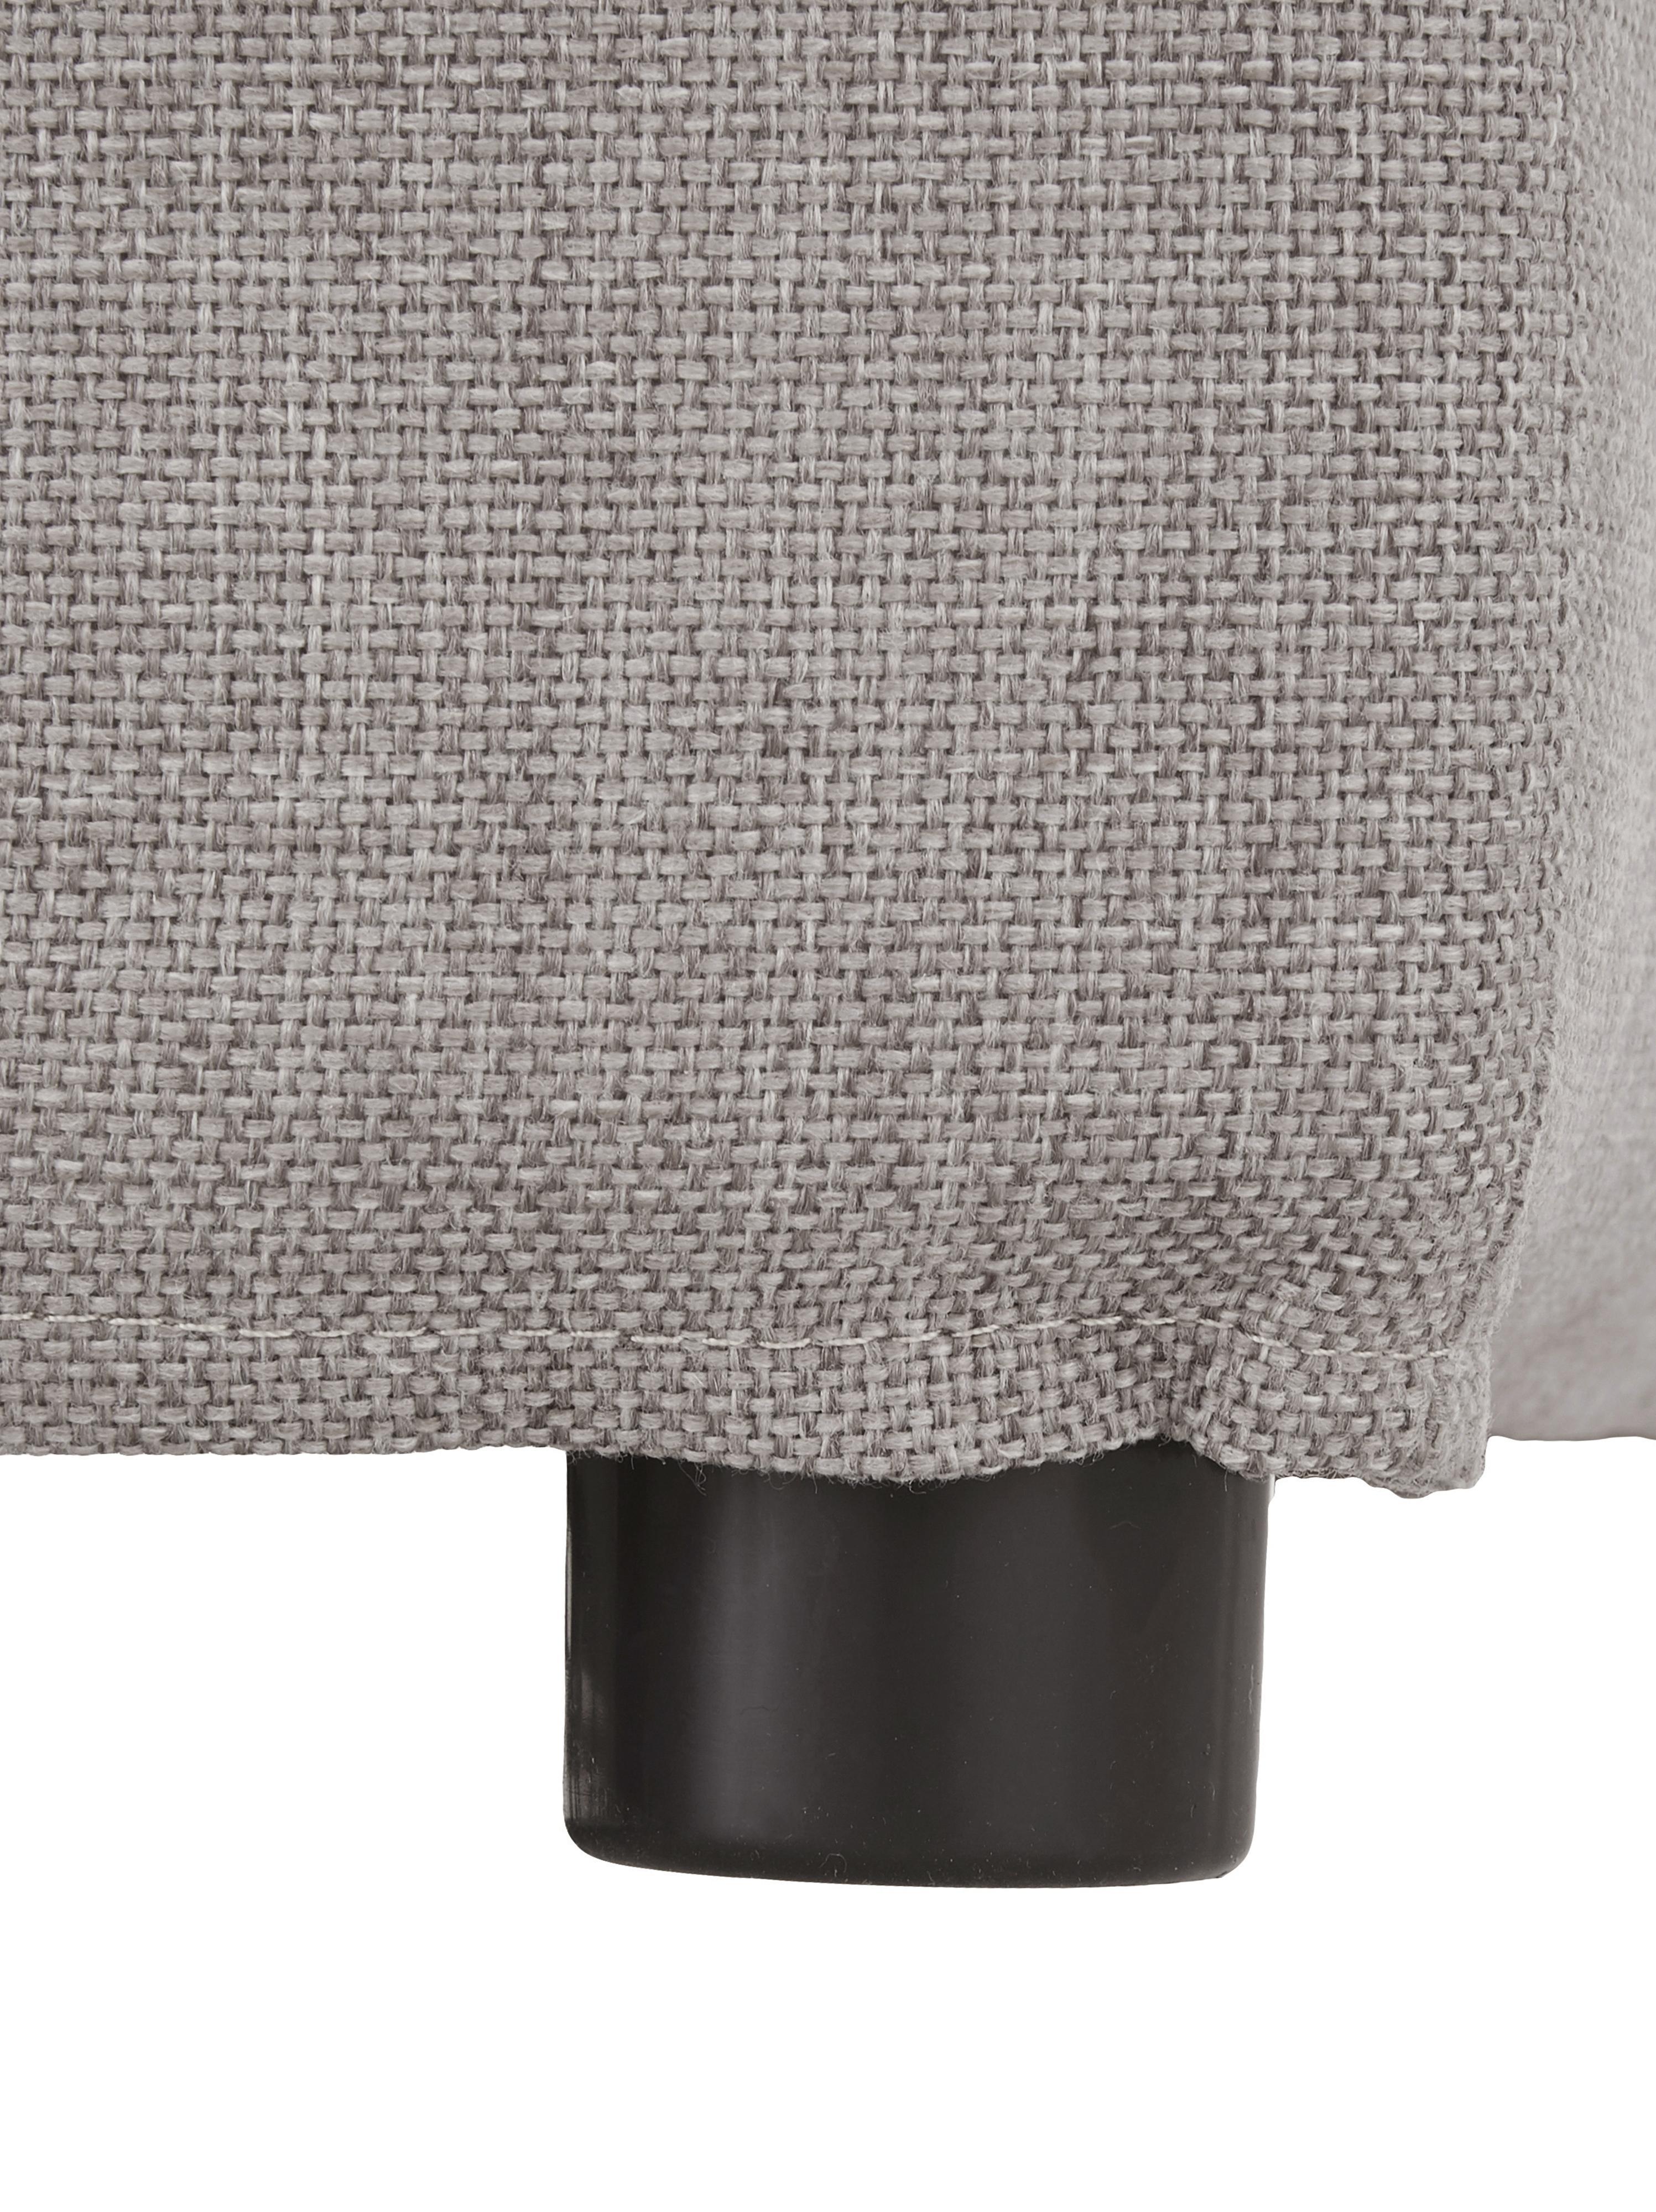 Hoekbank Zach, Bekleding: polypropyleen, Poten: kunststof, Geweven stof taupe, B 300 x D 213 cm